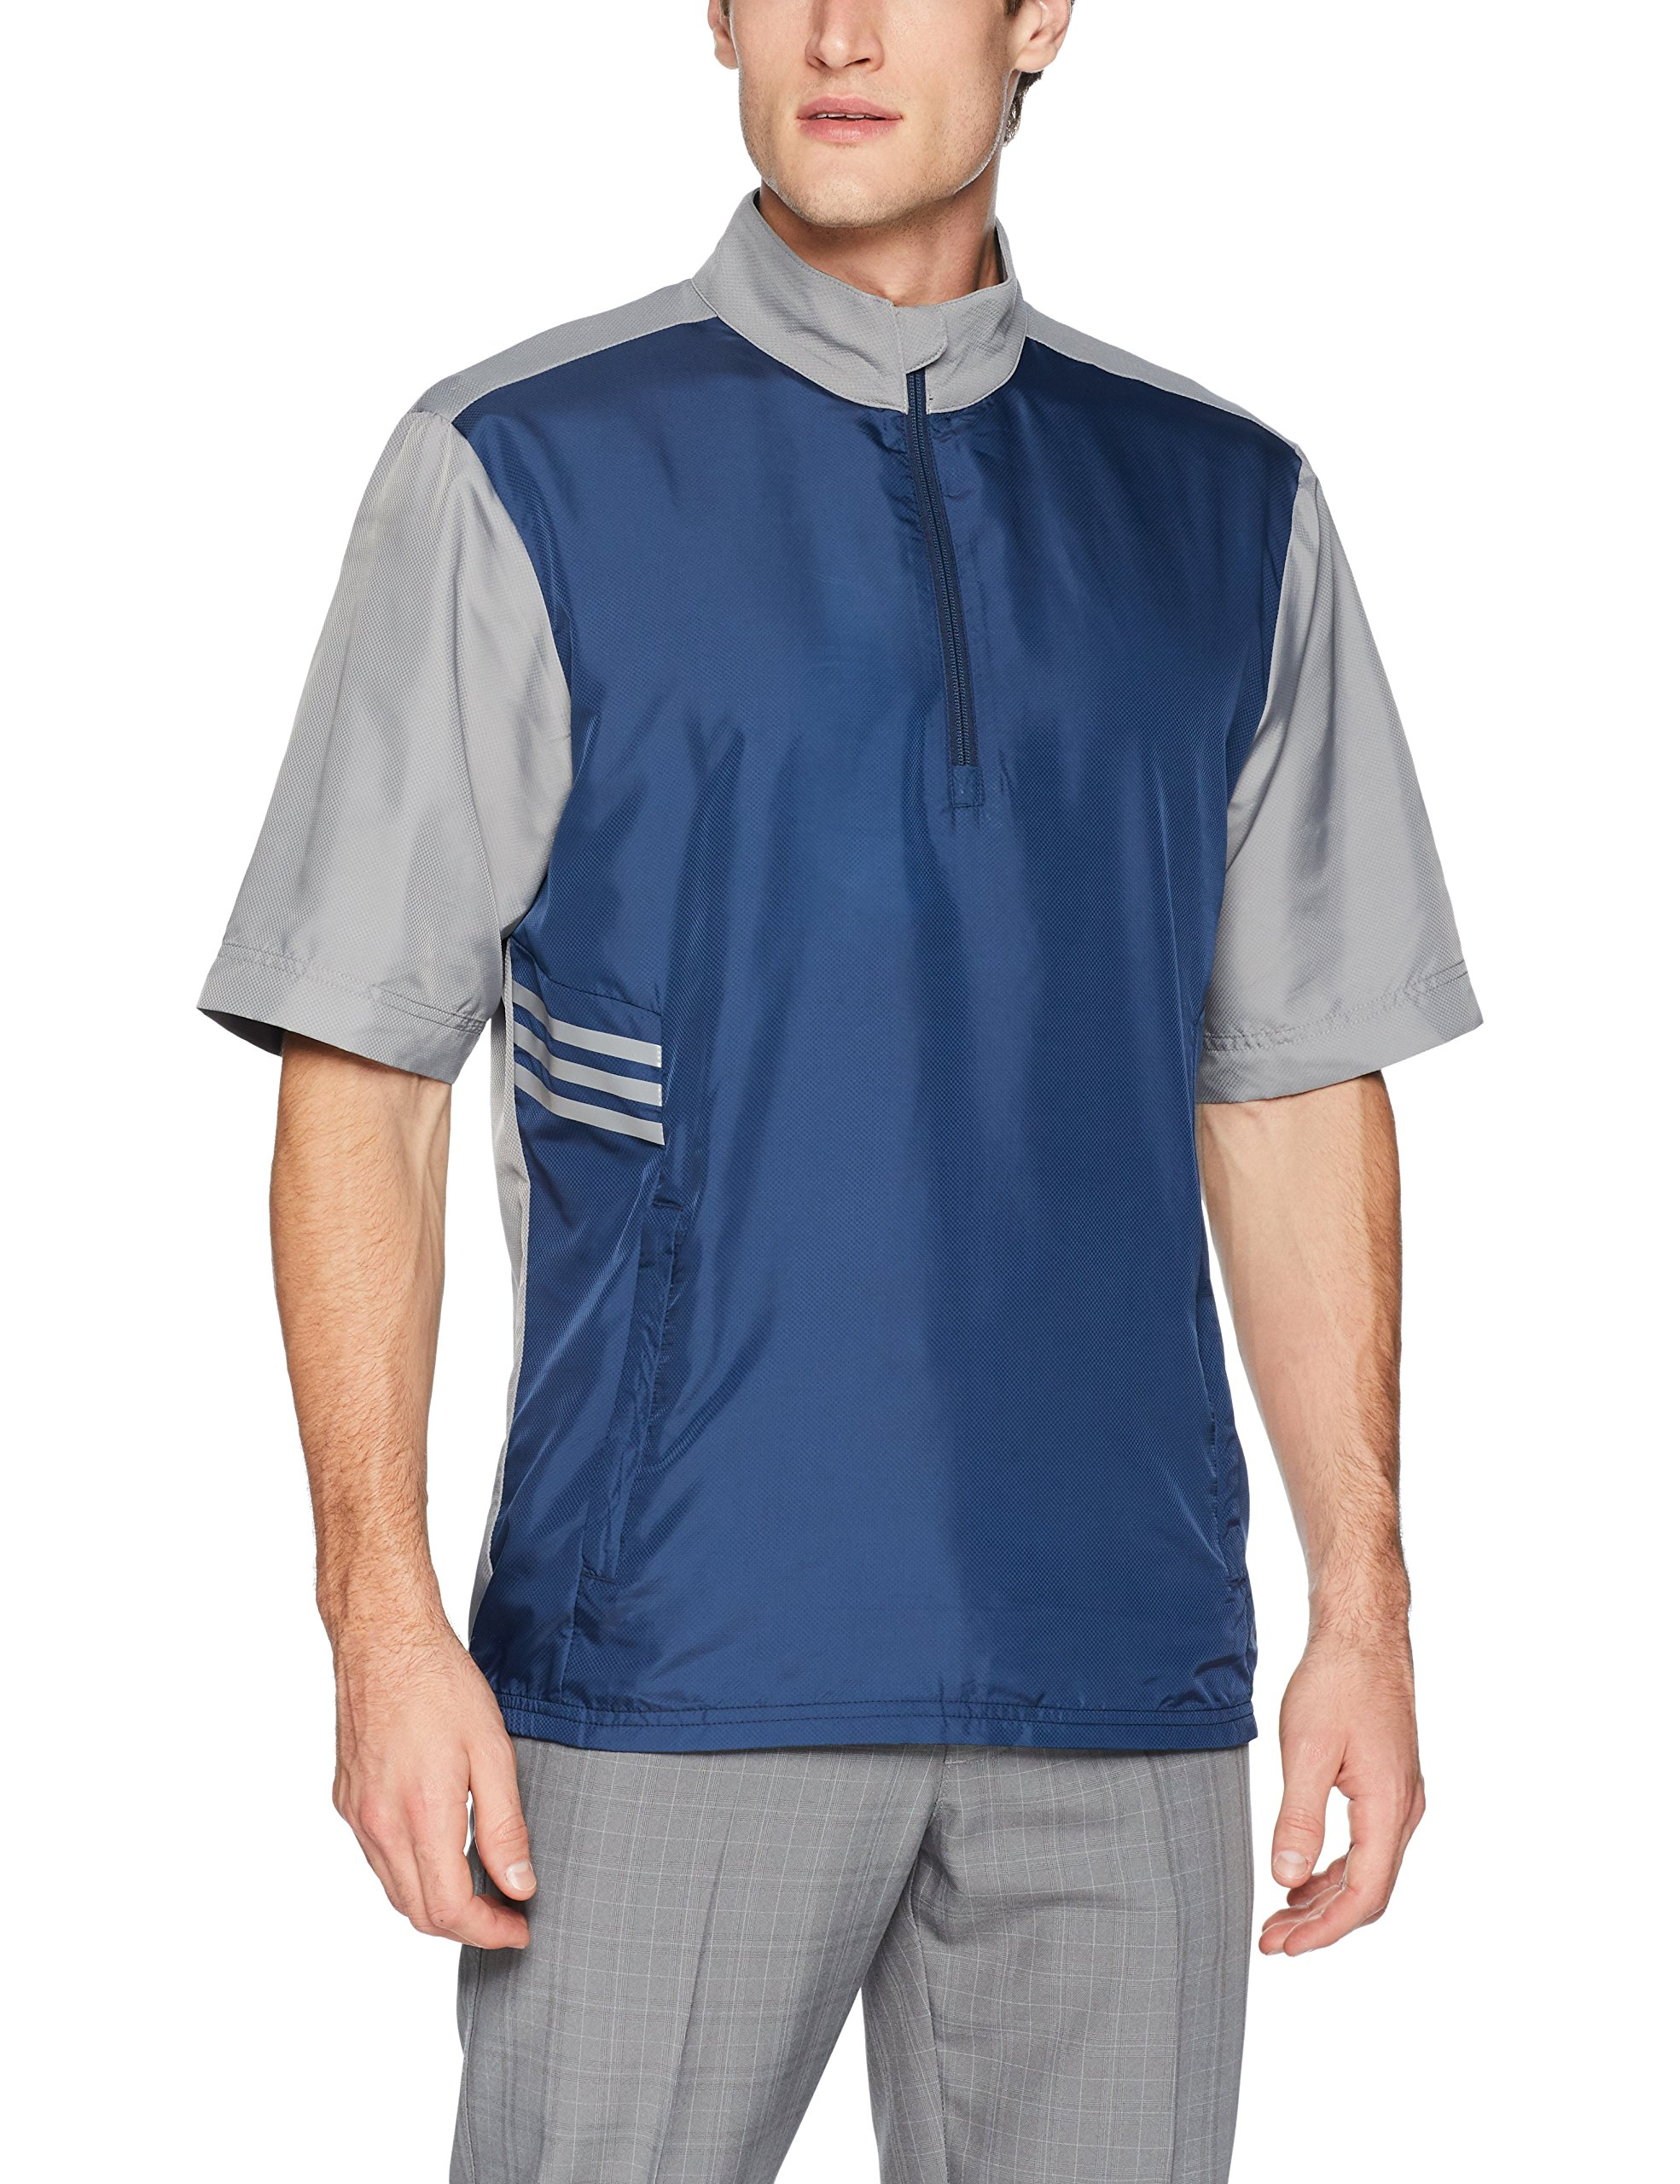 adidas Golf Club Short sleeve Wind Jacket, Collegiate Navy, XX-Large